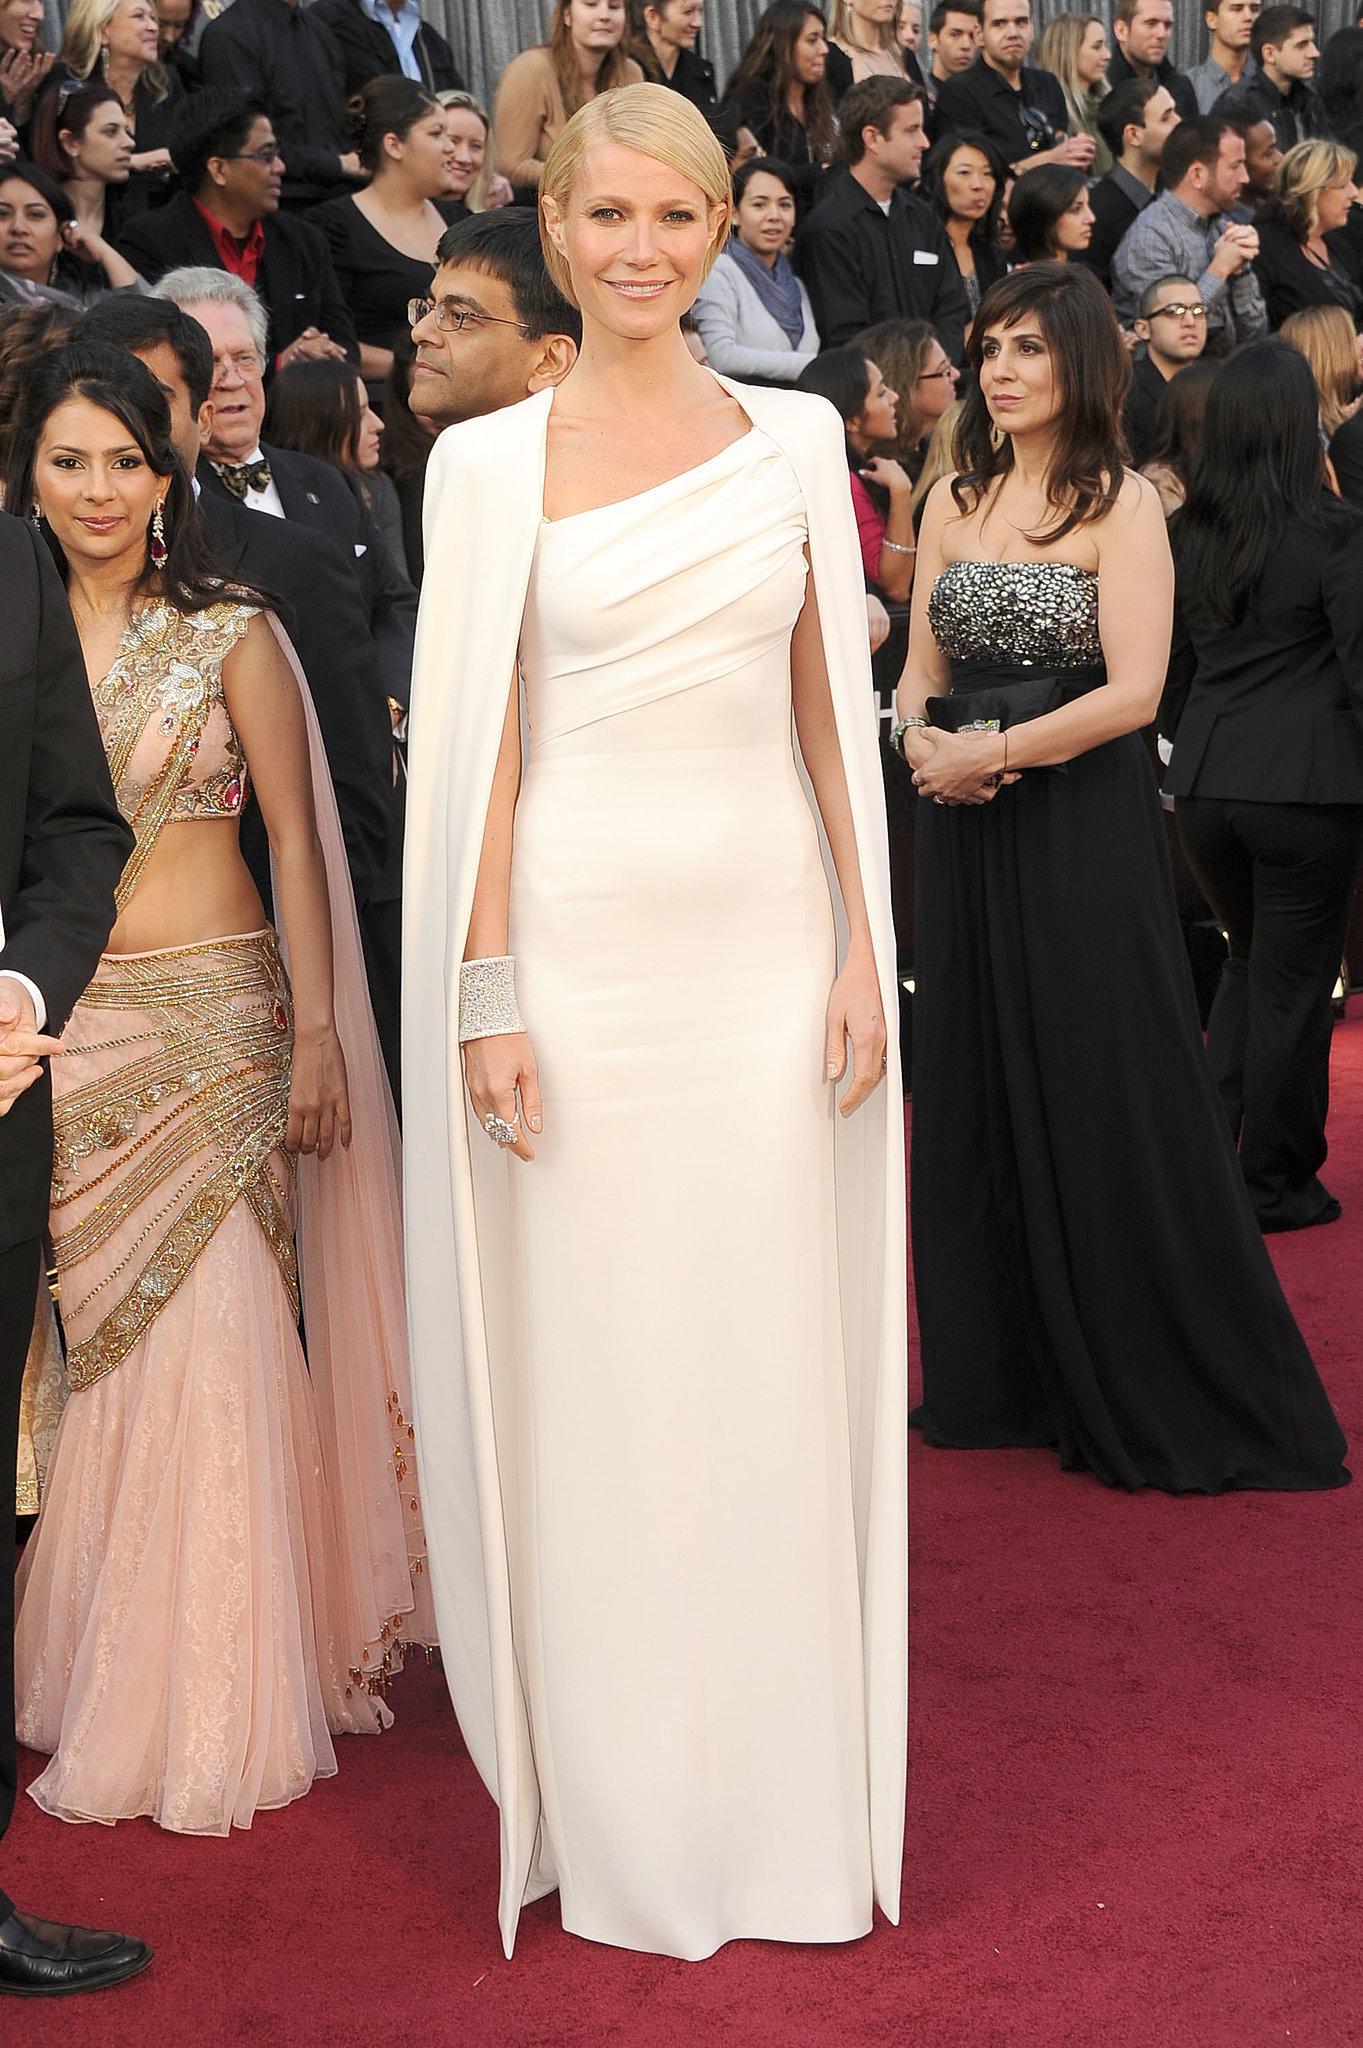 Gwyneth Paltrow at the 2012 Academy Awards